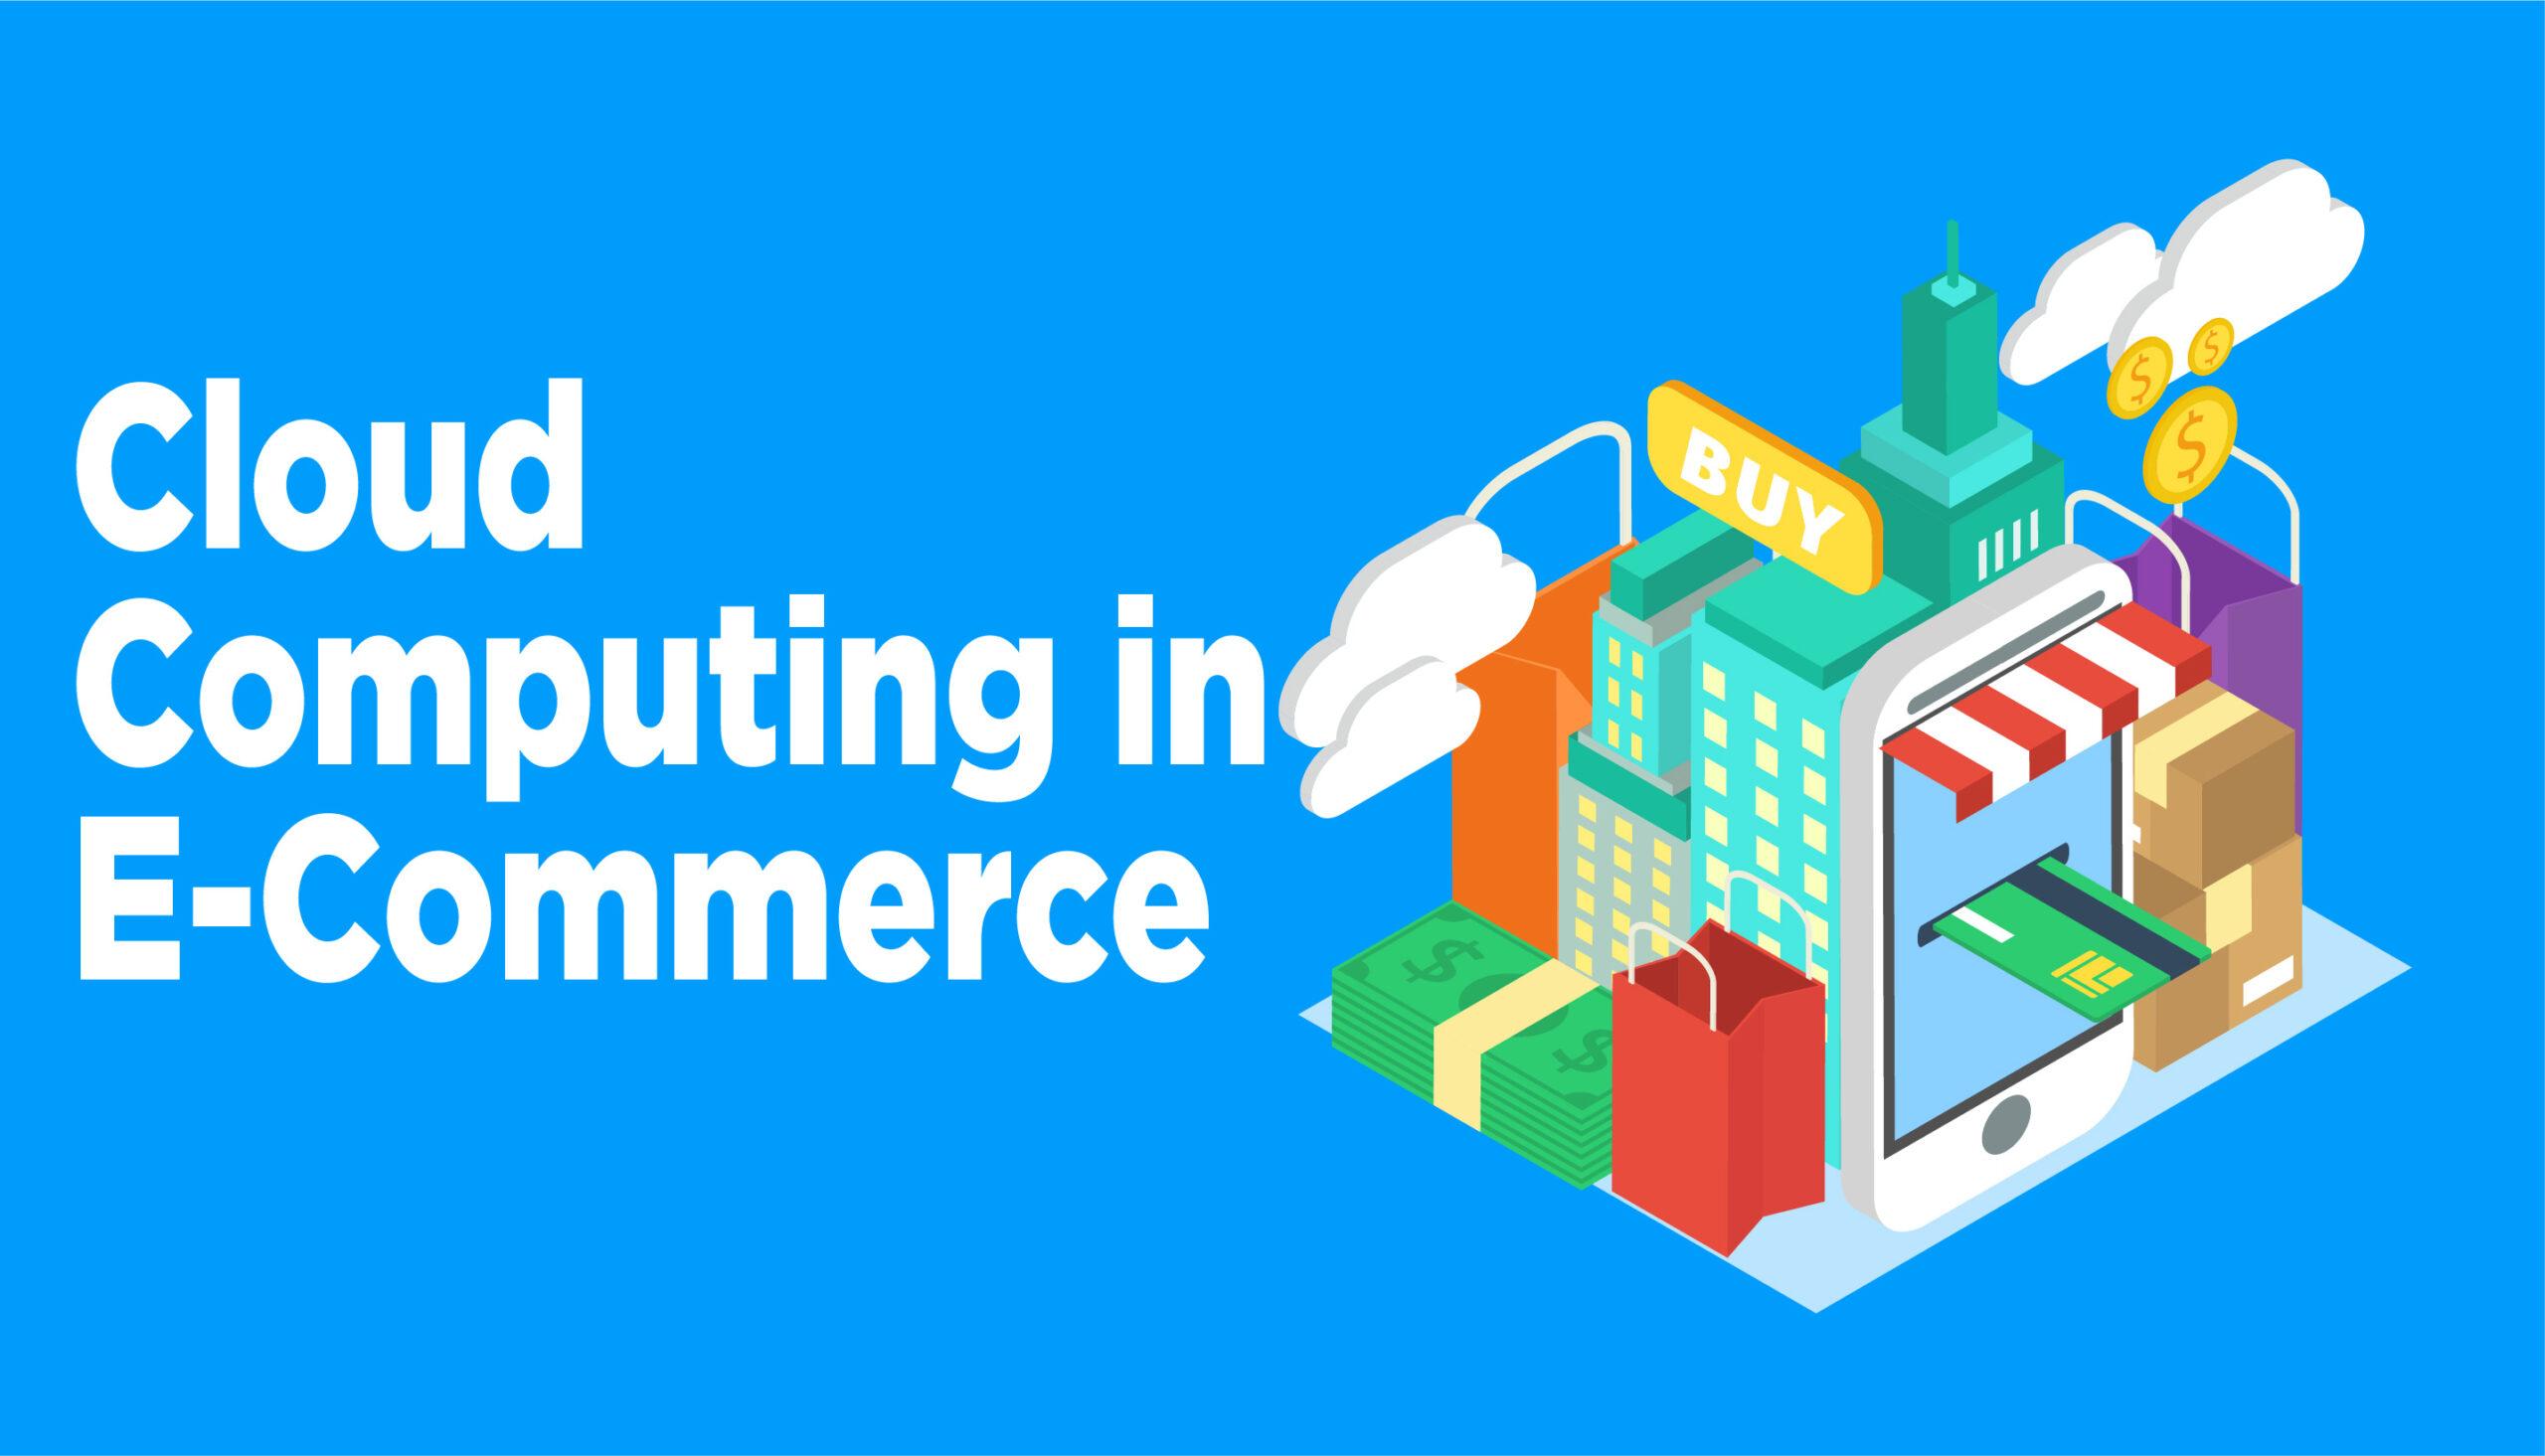 Cloud computing in E-commerce